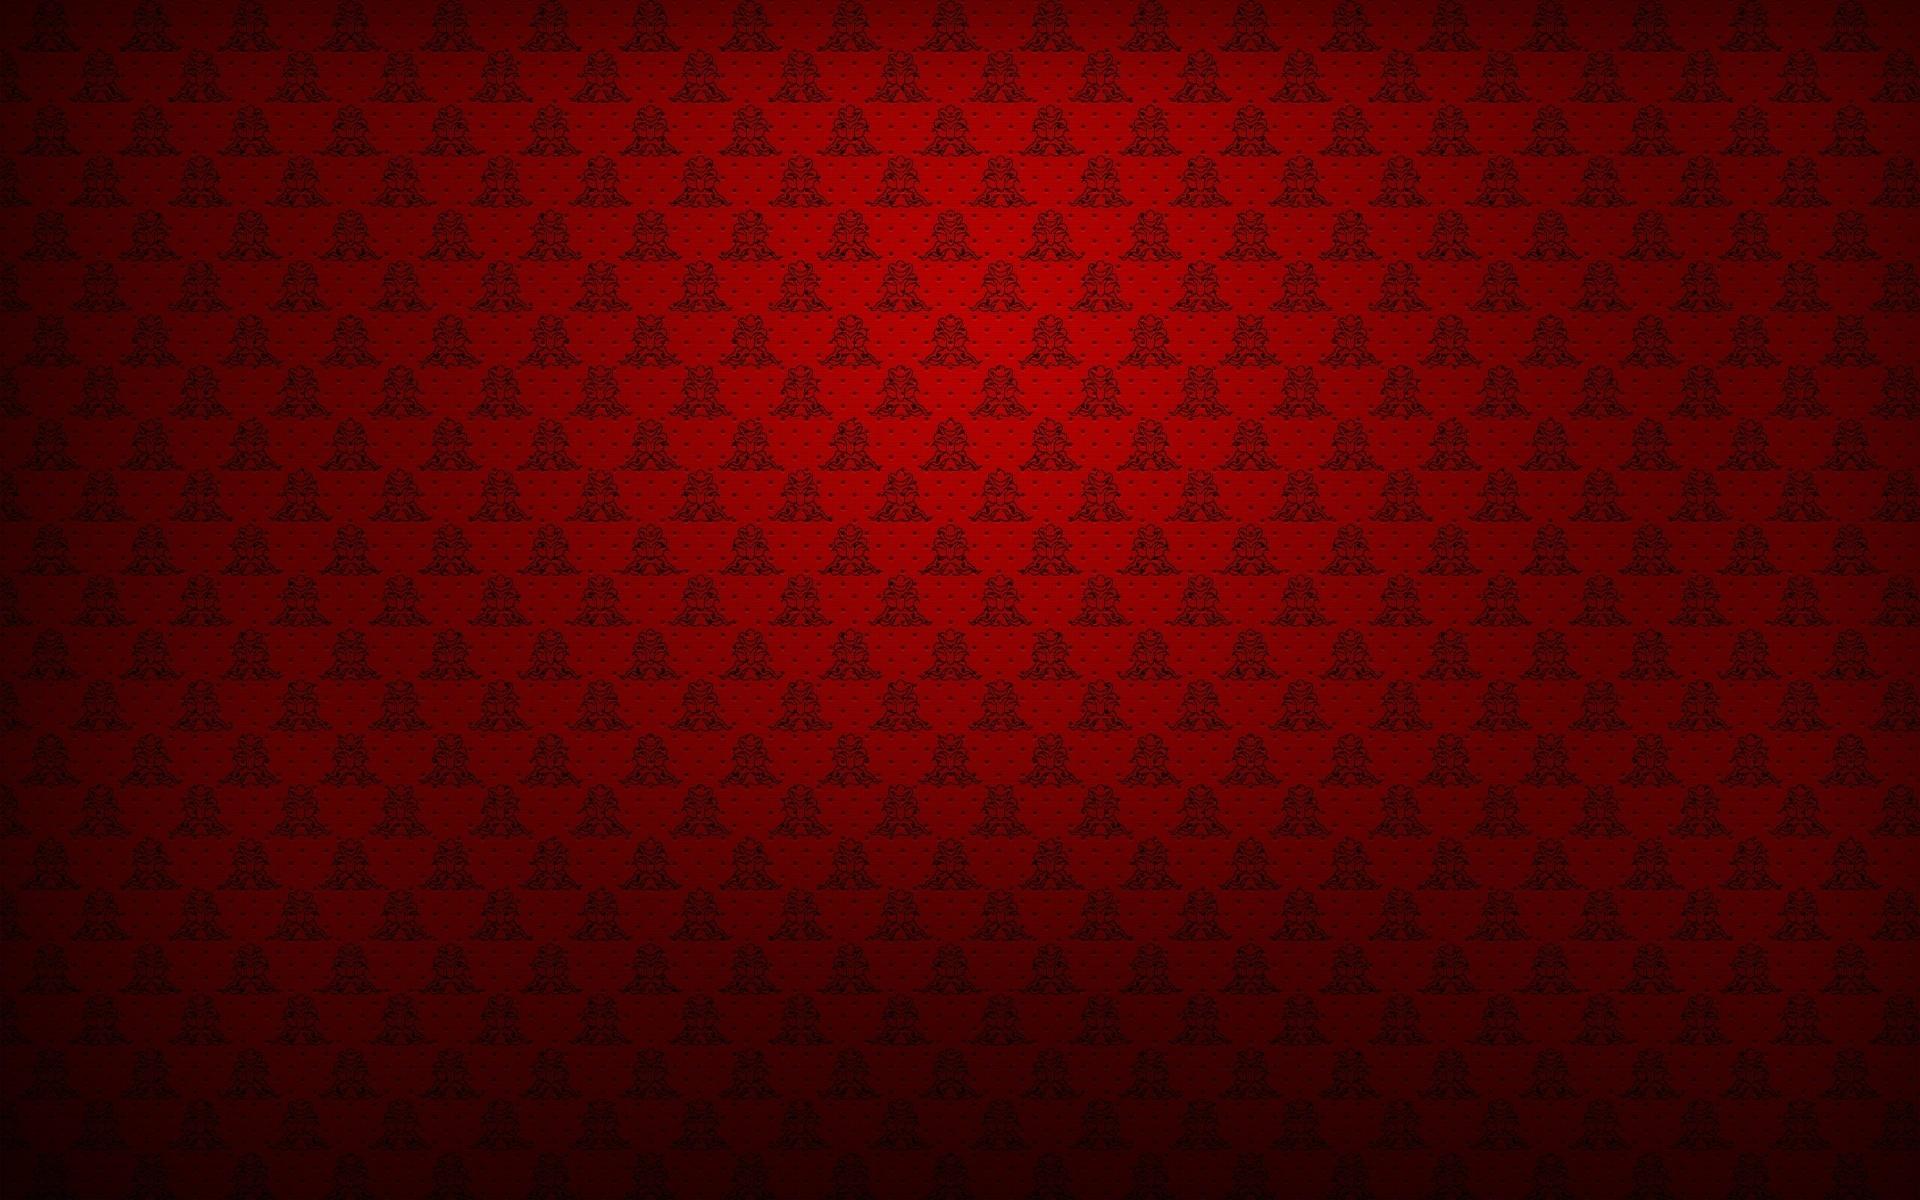 Best-new-background-patterns-Red-Patterns-1920-Red-Patterns-Background-Imageif-thr-wallpaper-wp3403187